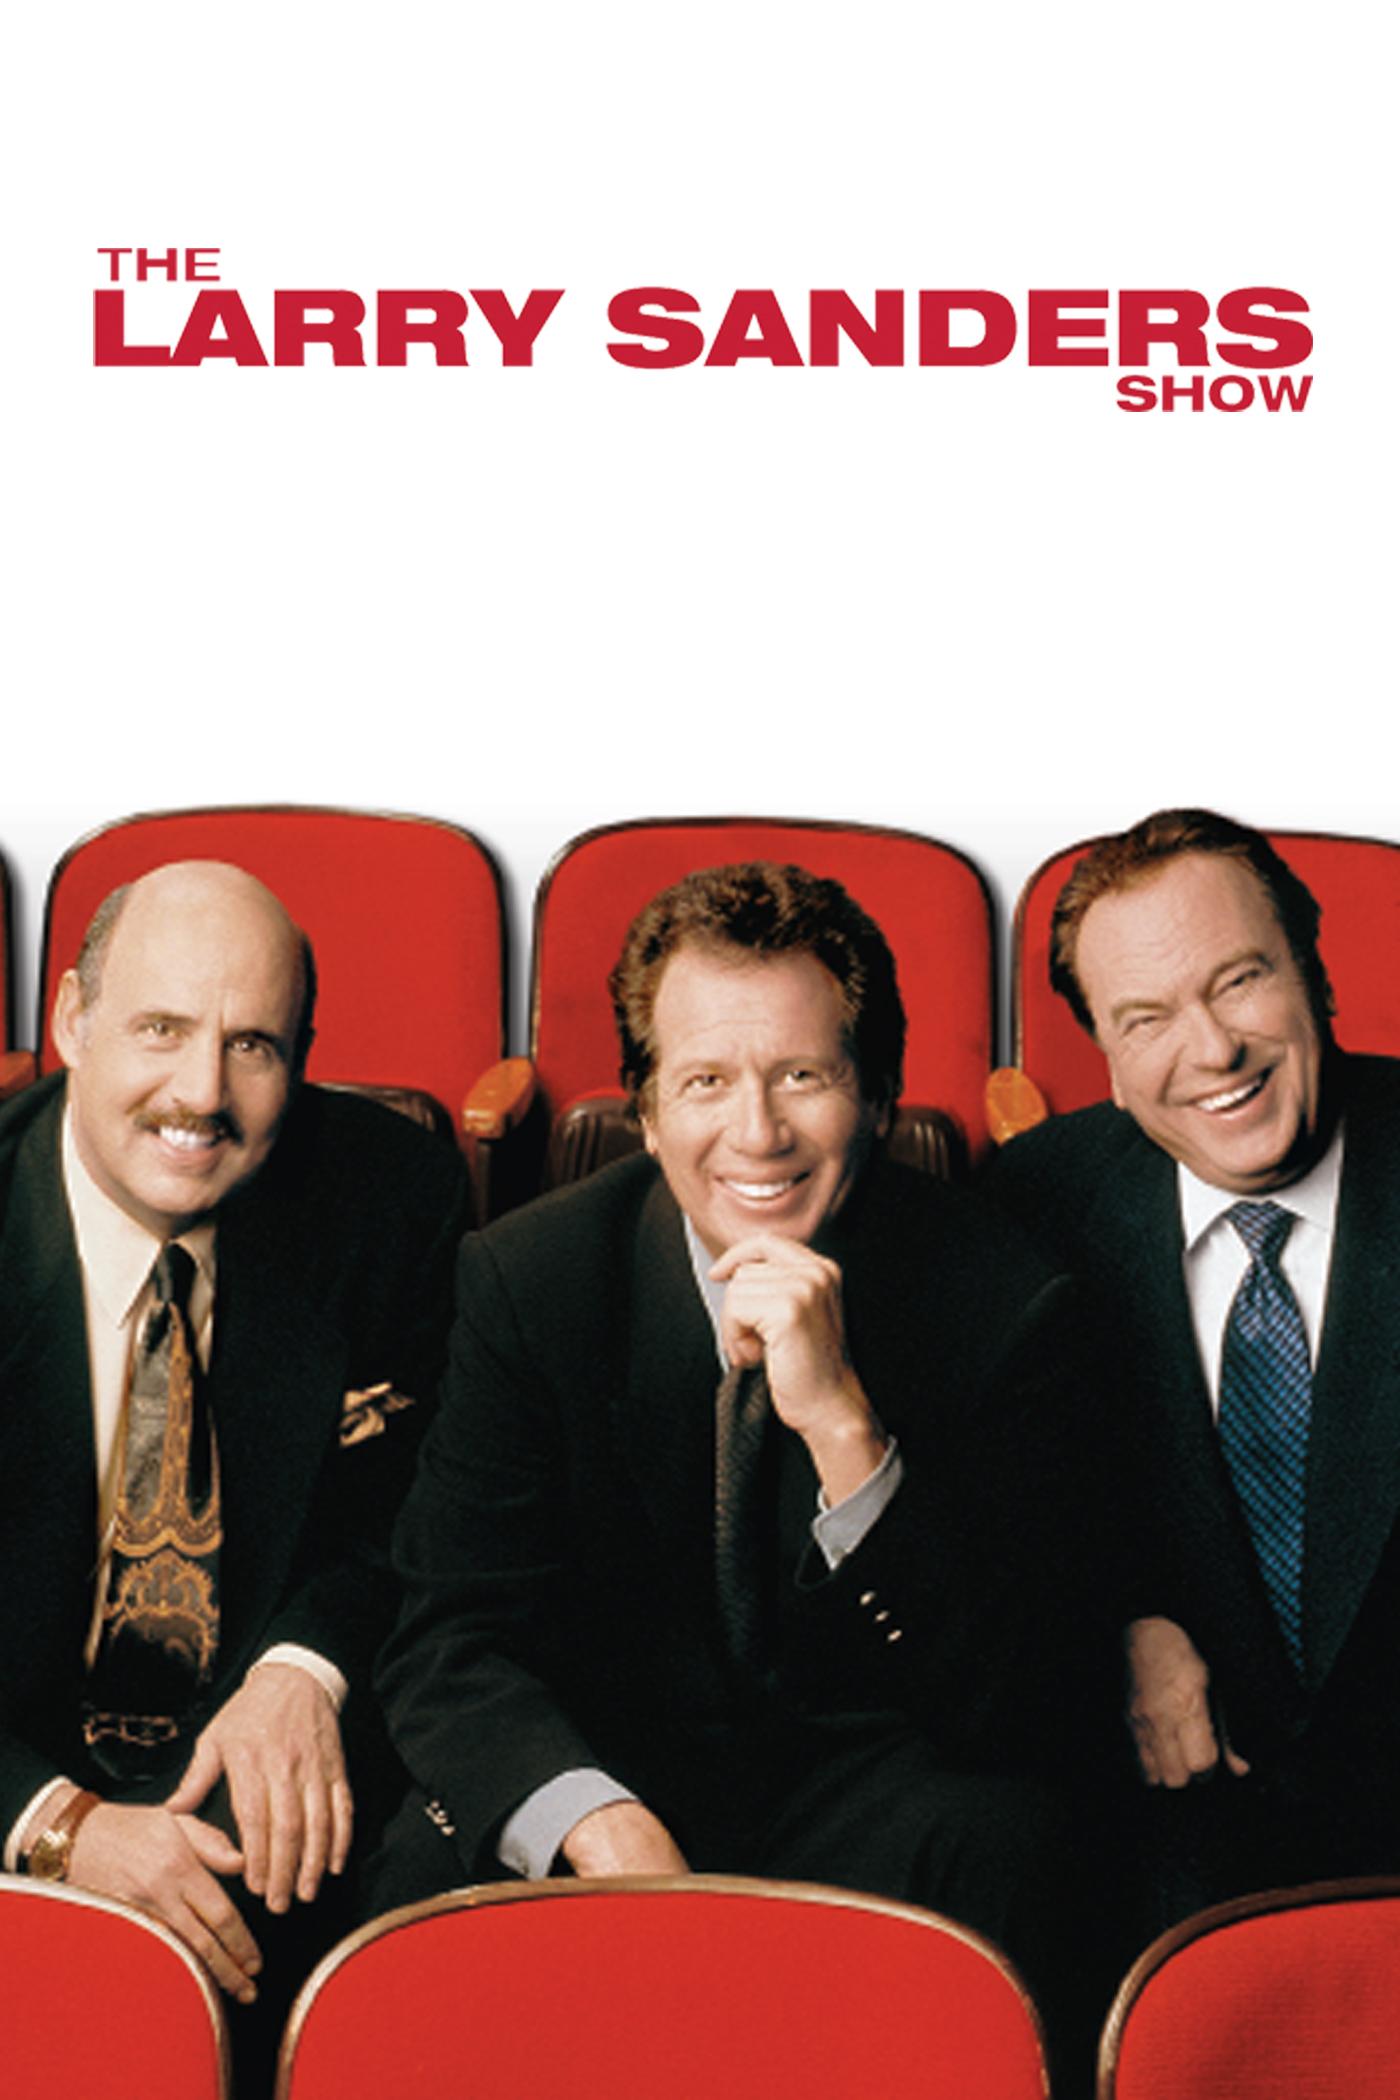 The Larry Sanders Show   Buy, Rent or Watch on FandangoNOW